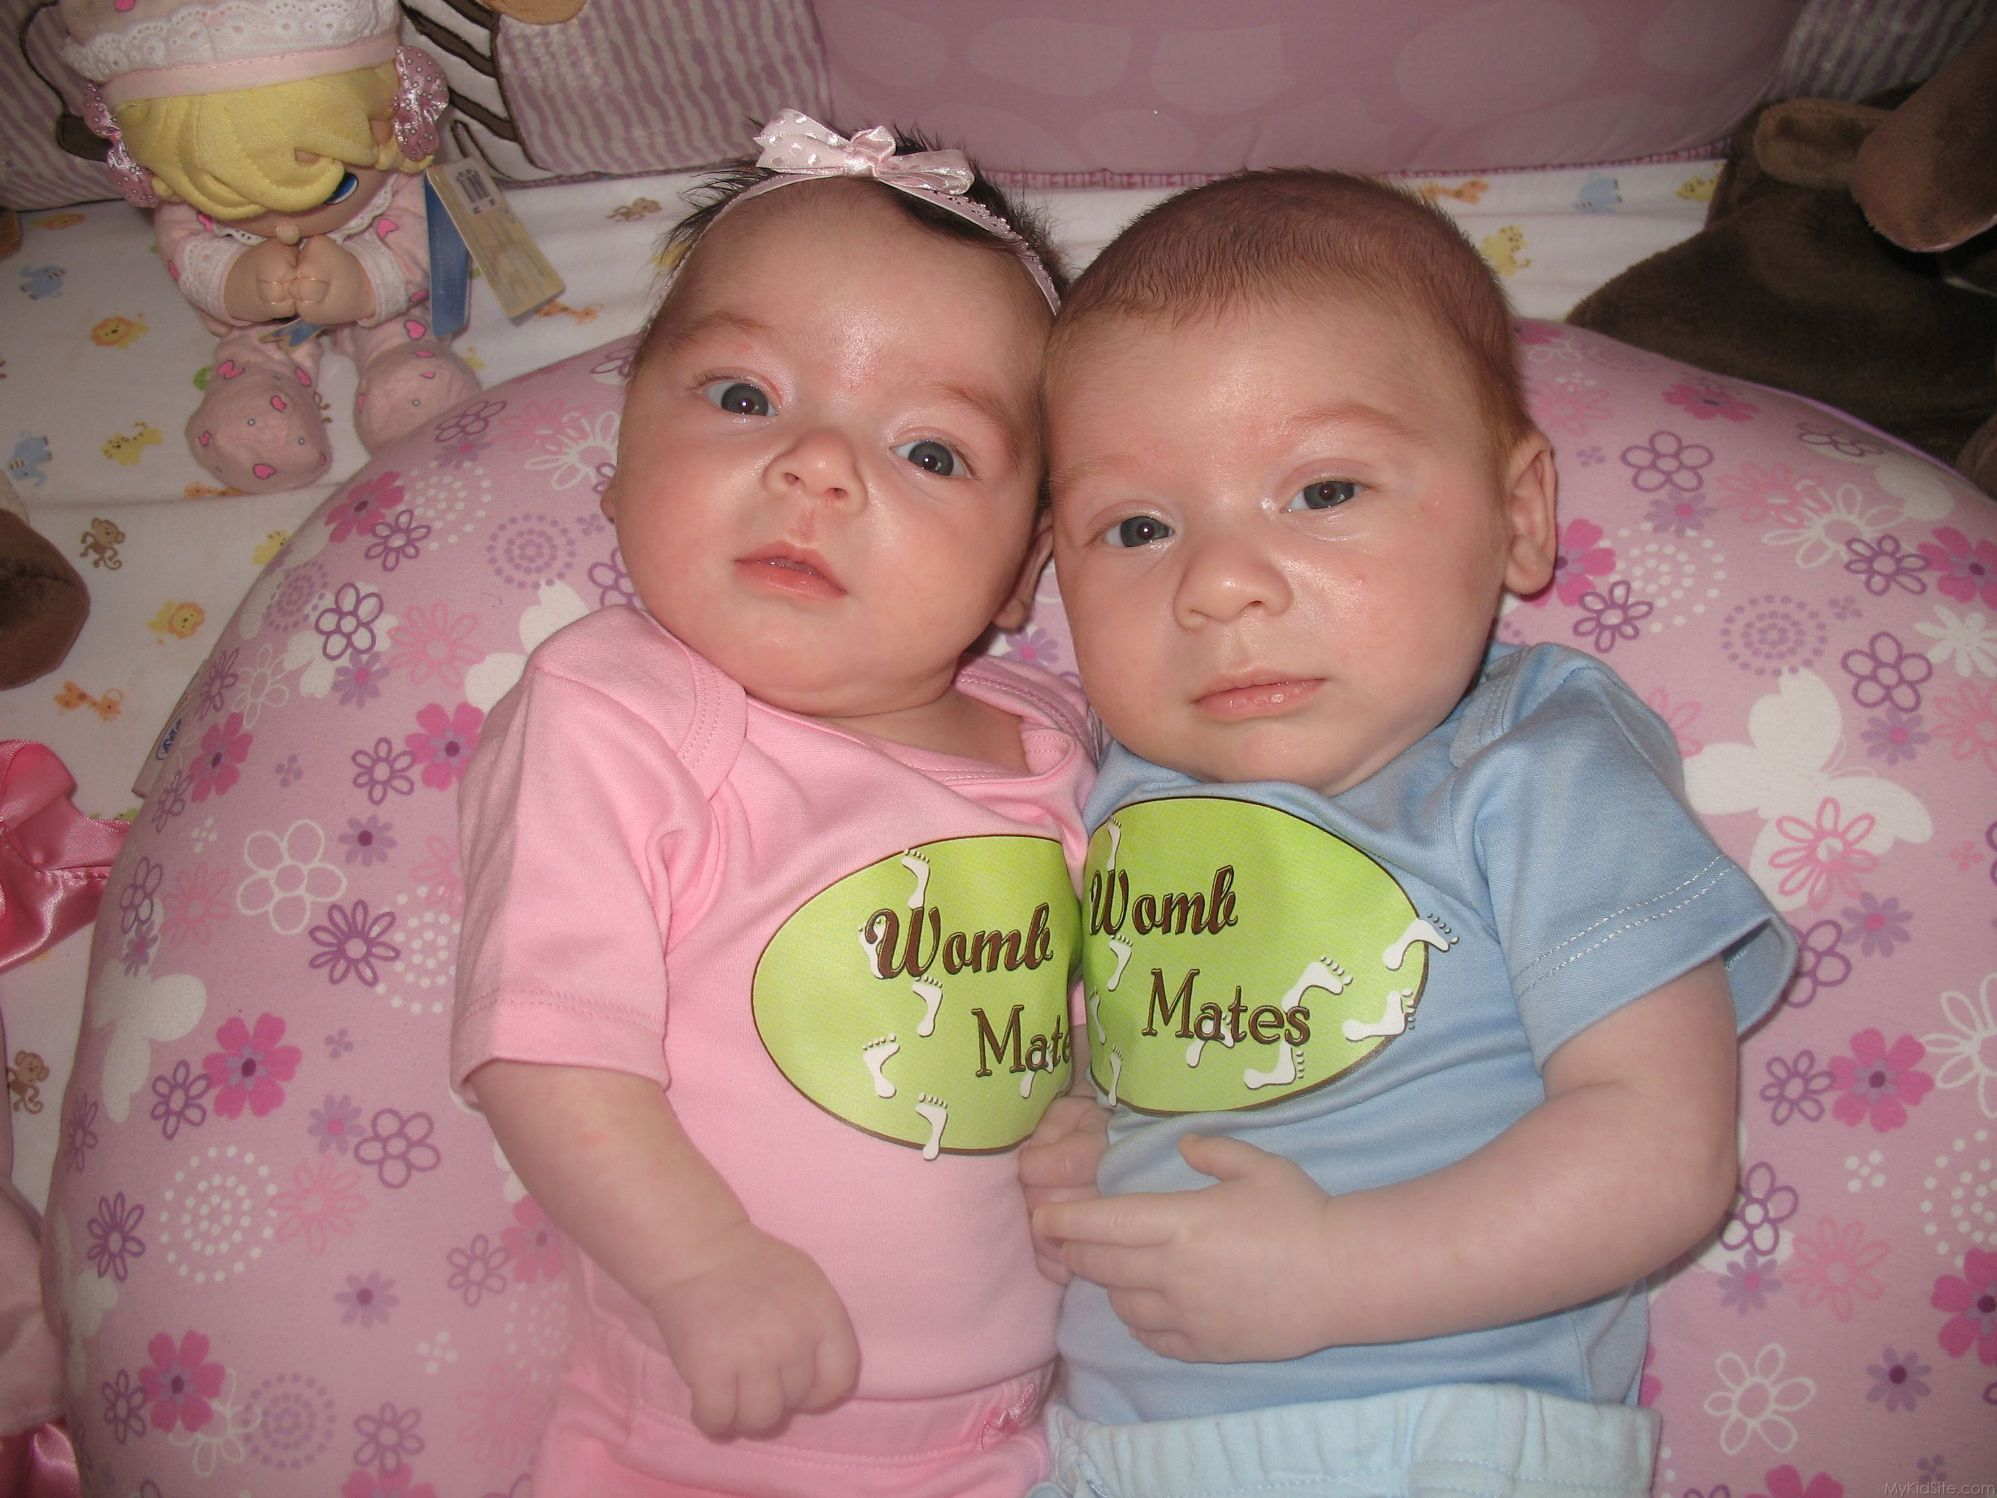 Sad Babies